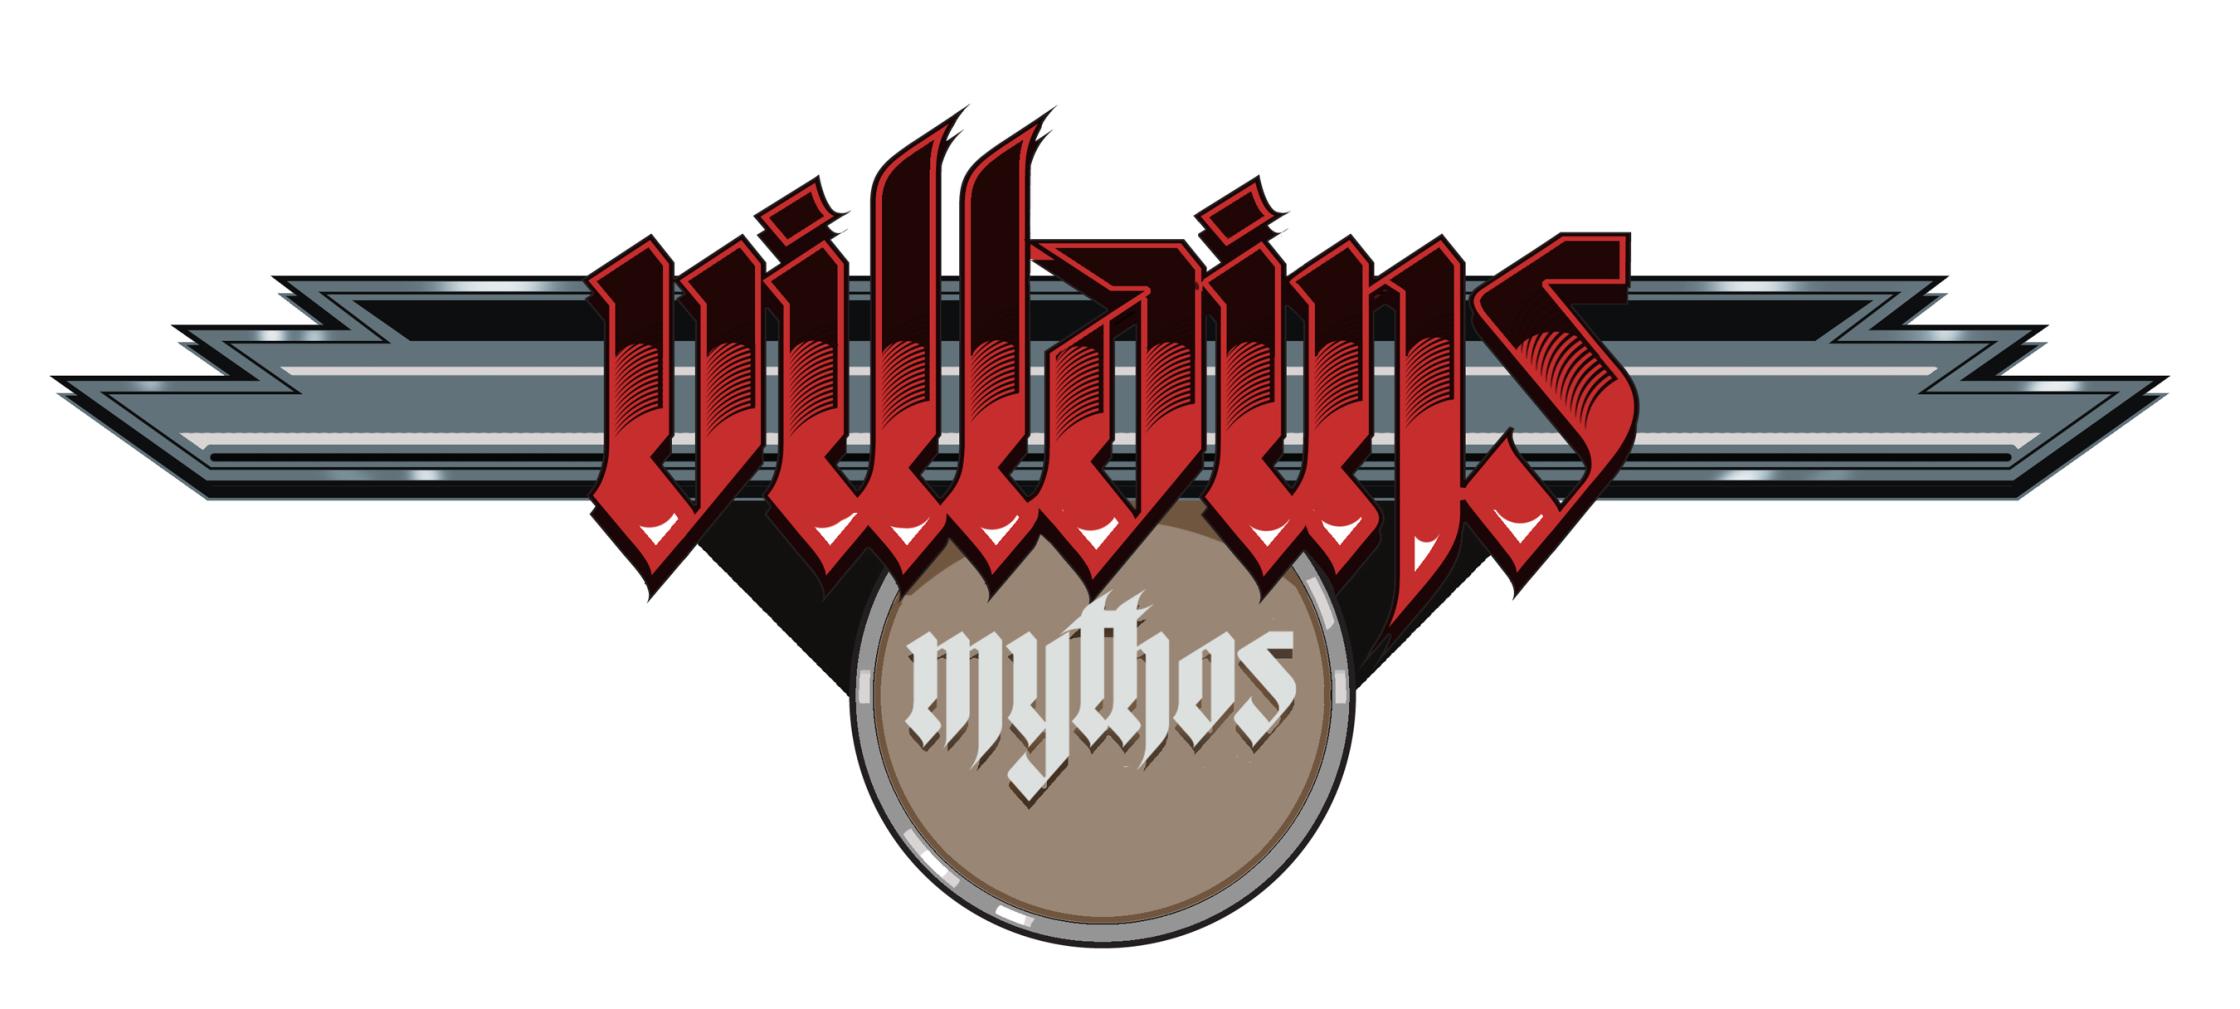 59-villains-logo.jpg